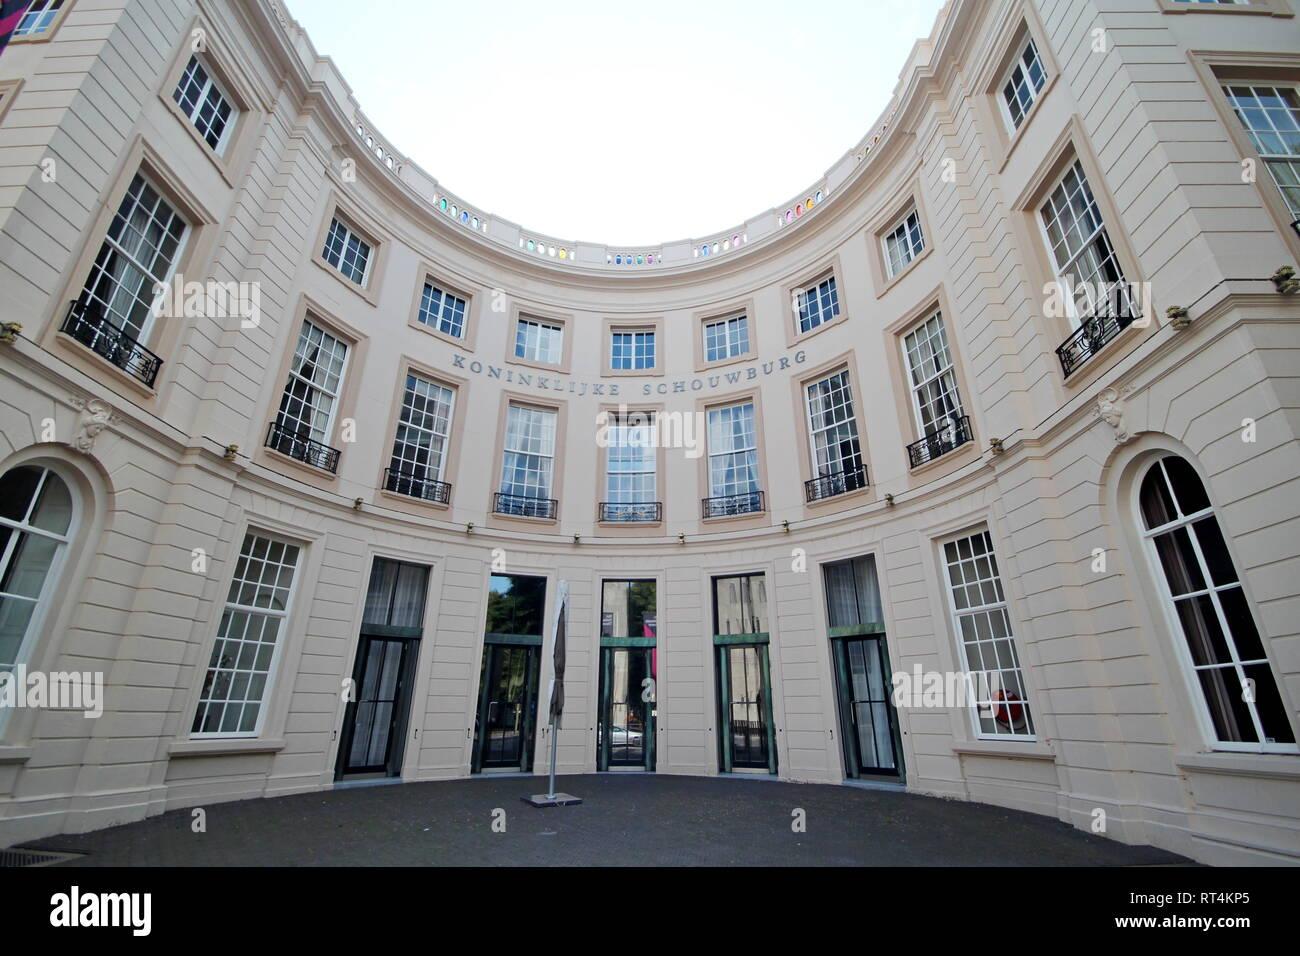 Royal theater named koninklijke schouwburg in the city center of The Hague - Stock Image